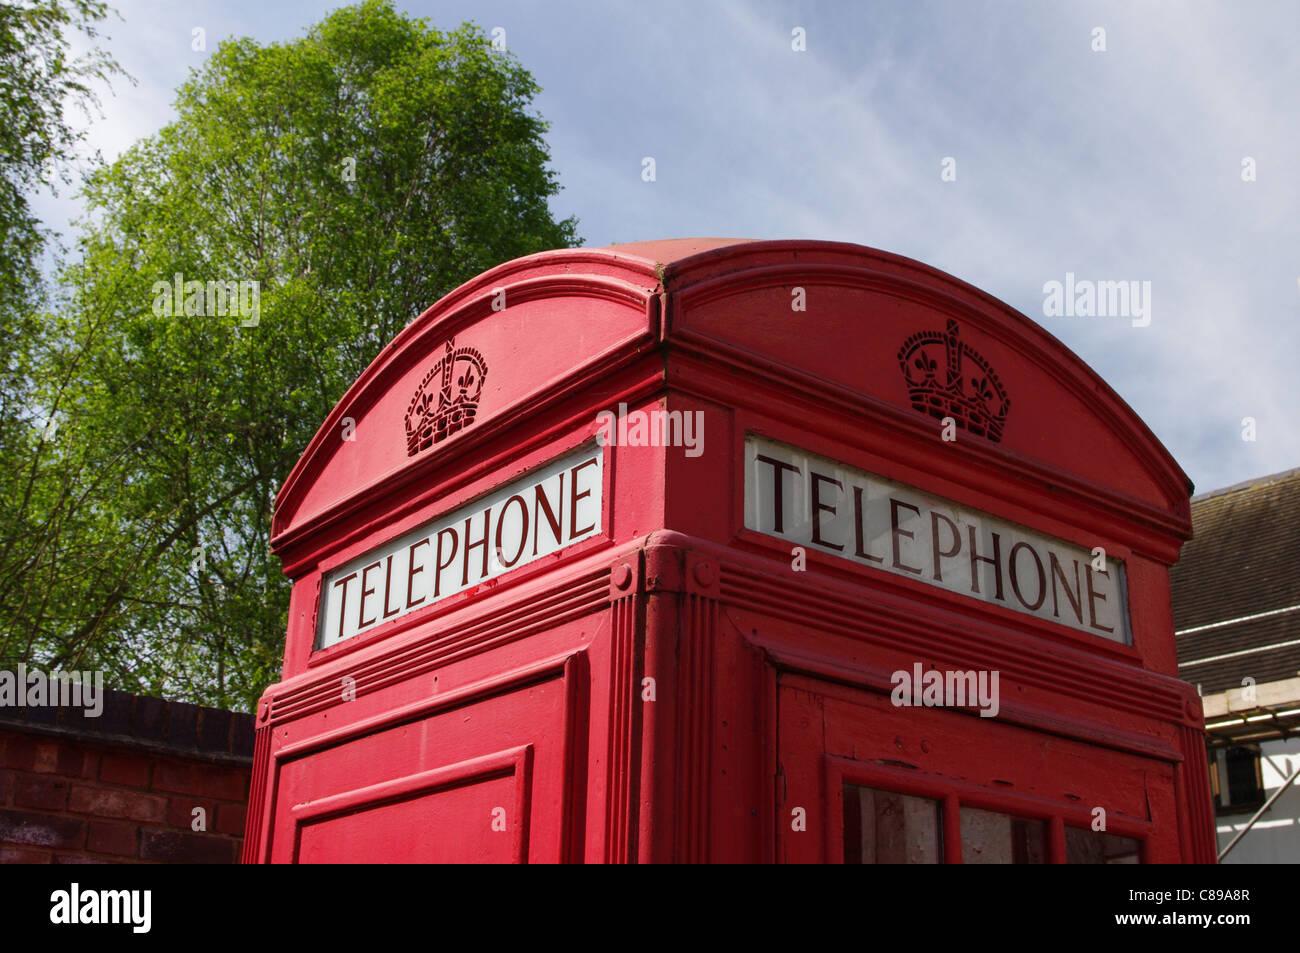 Top of red telephone kiosk, Avoncroft Museum of Buildings, Bromsgrove - Stock Image